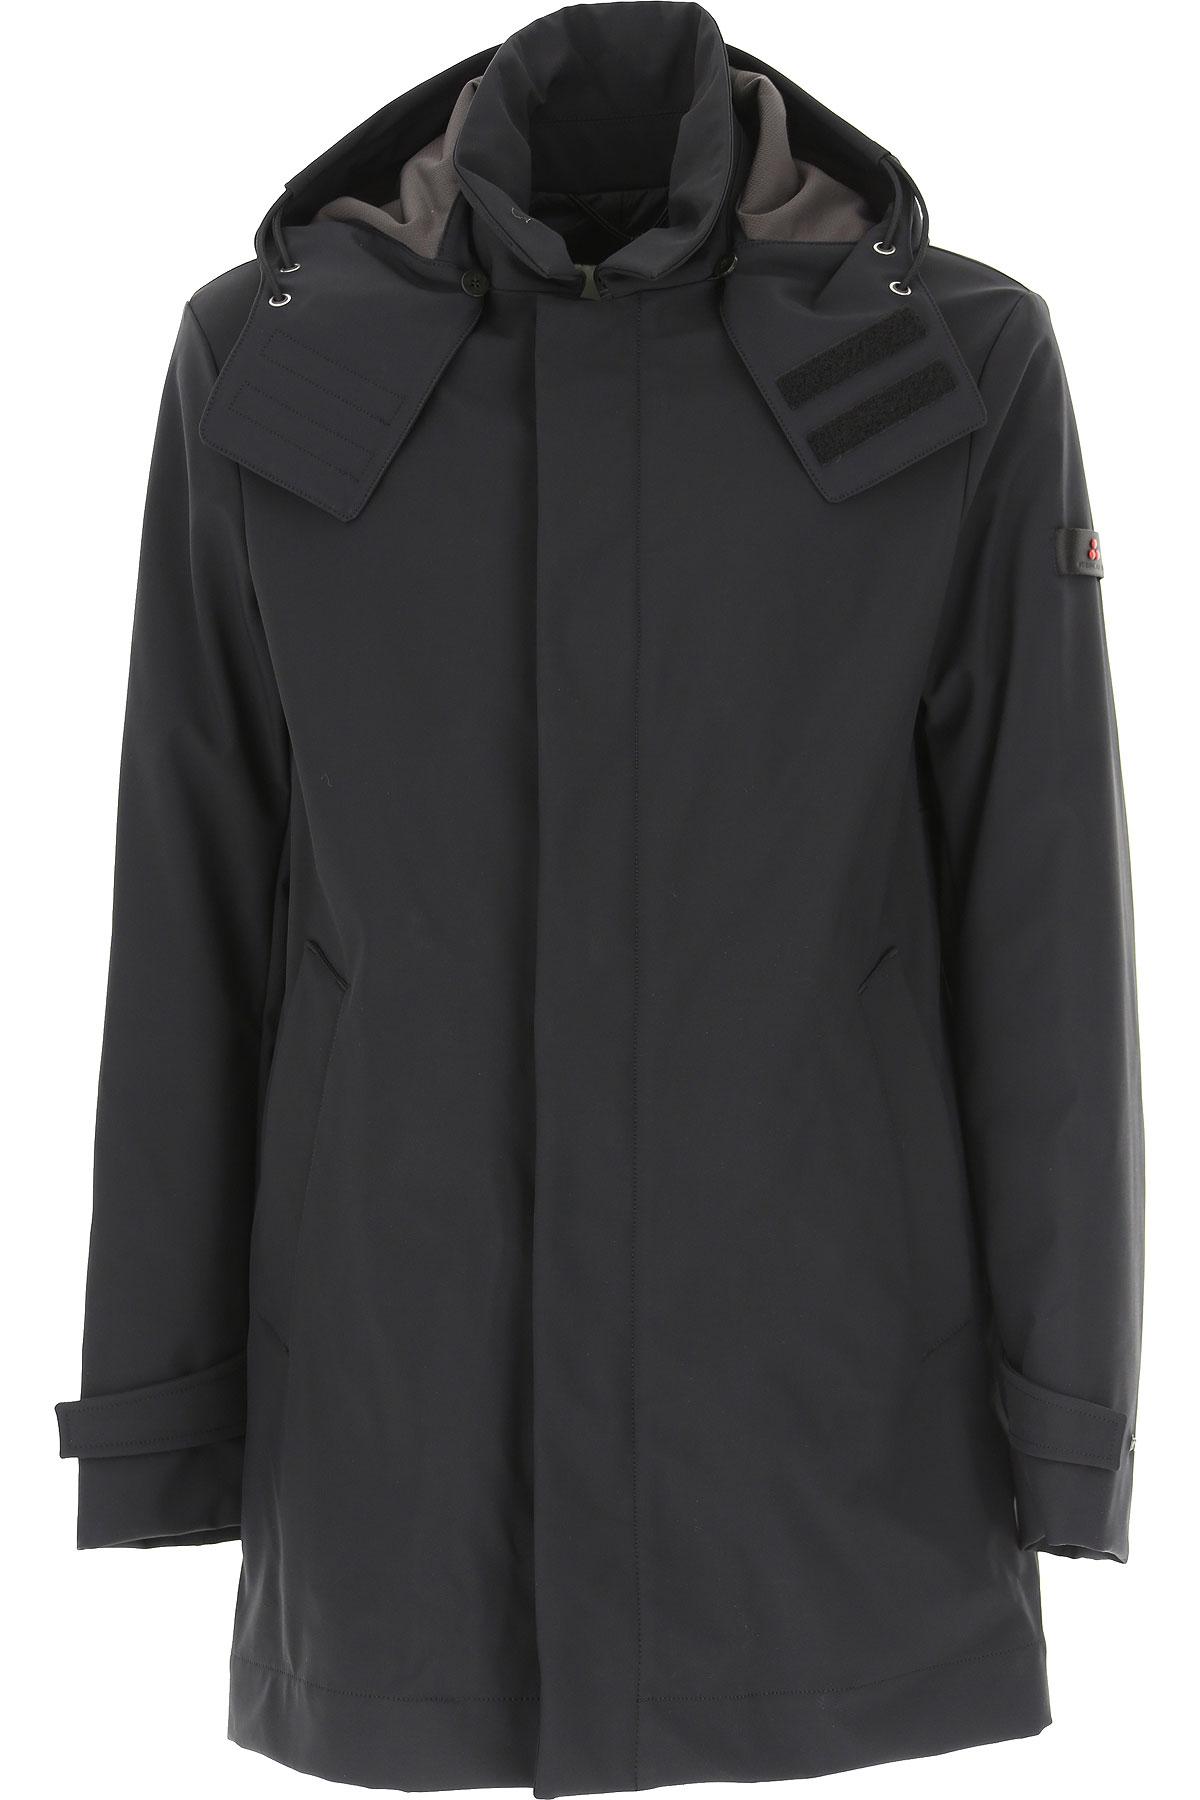 Peuterey Down Jacket for Men, Puffer Ski Jacket On Sale, Black, polyamide, 2019, L M S XL